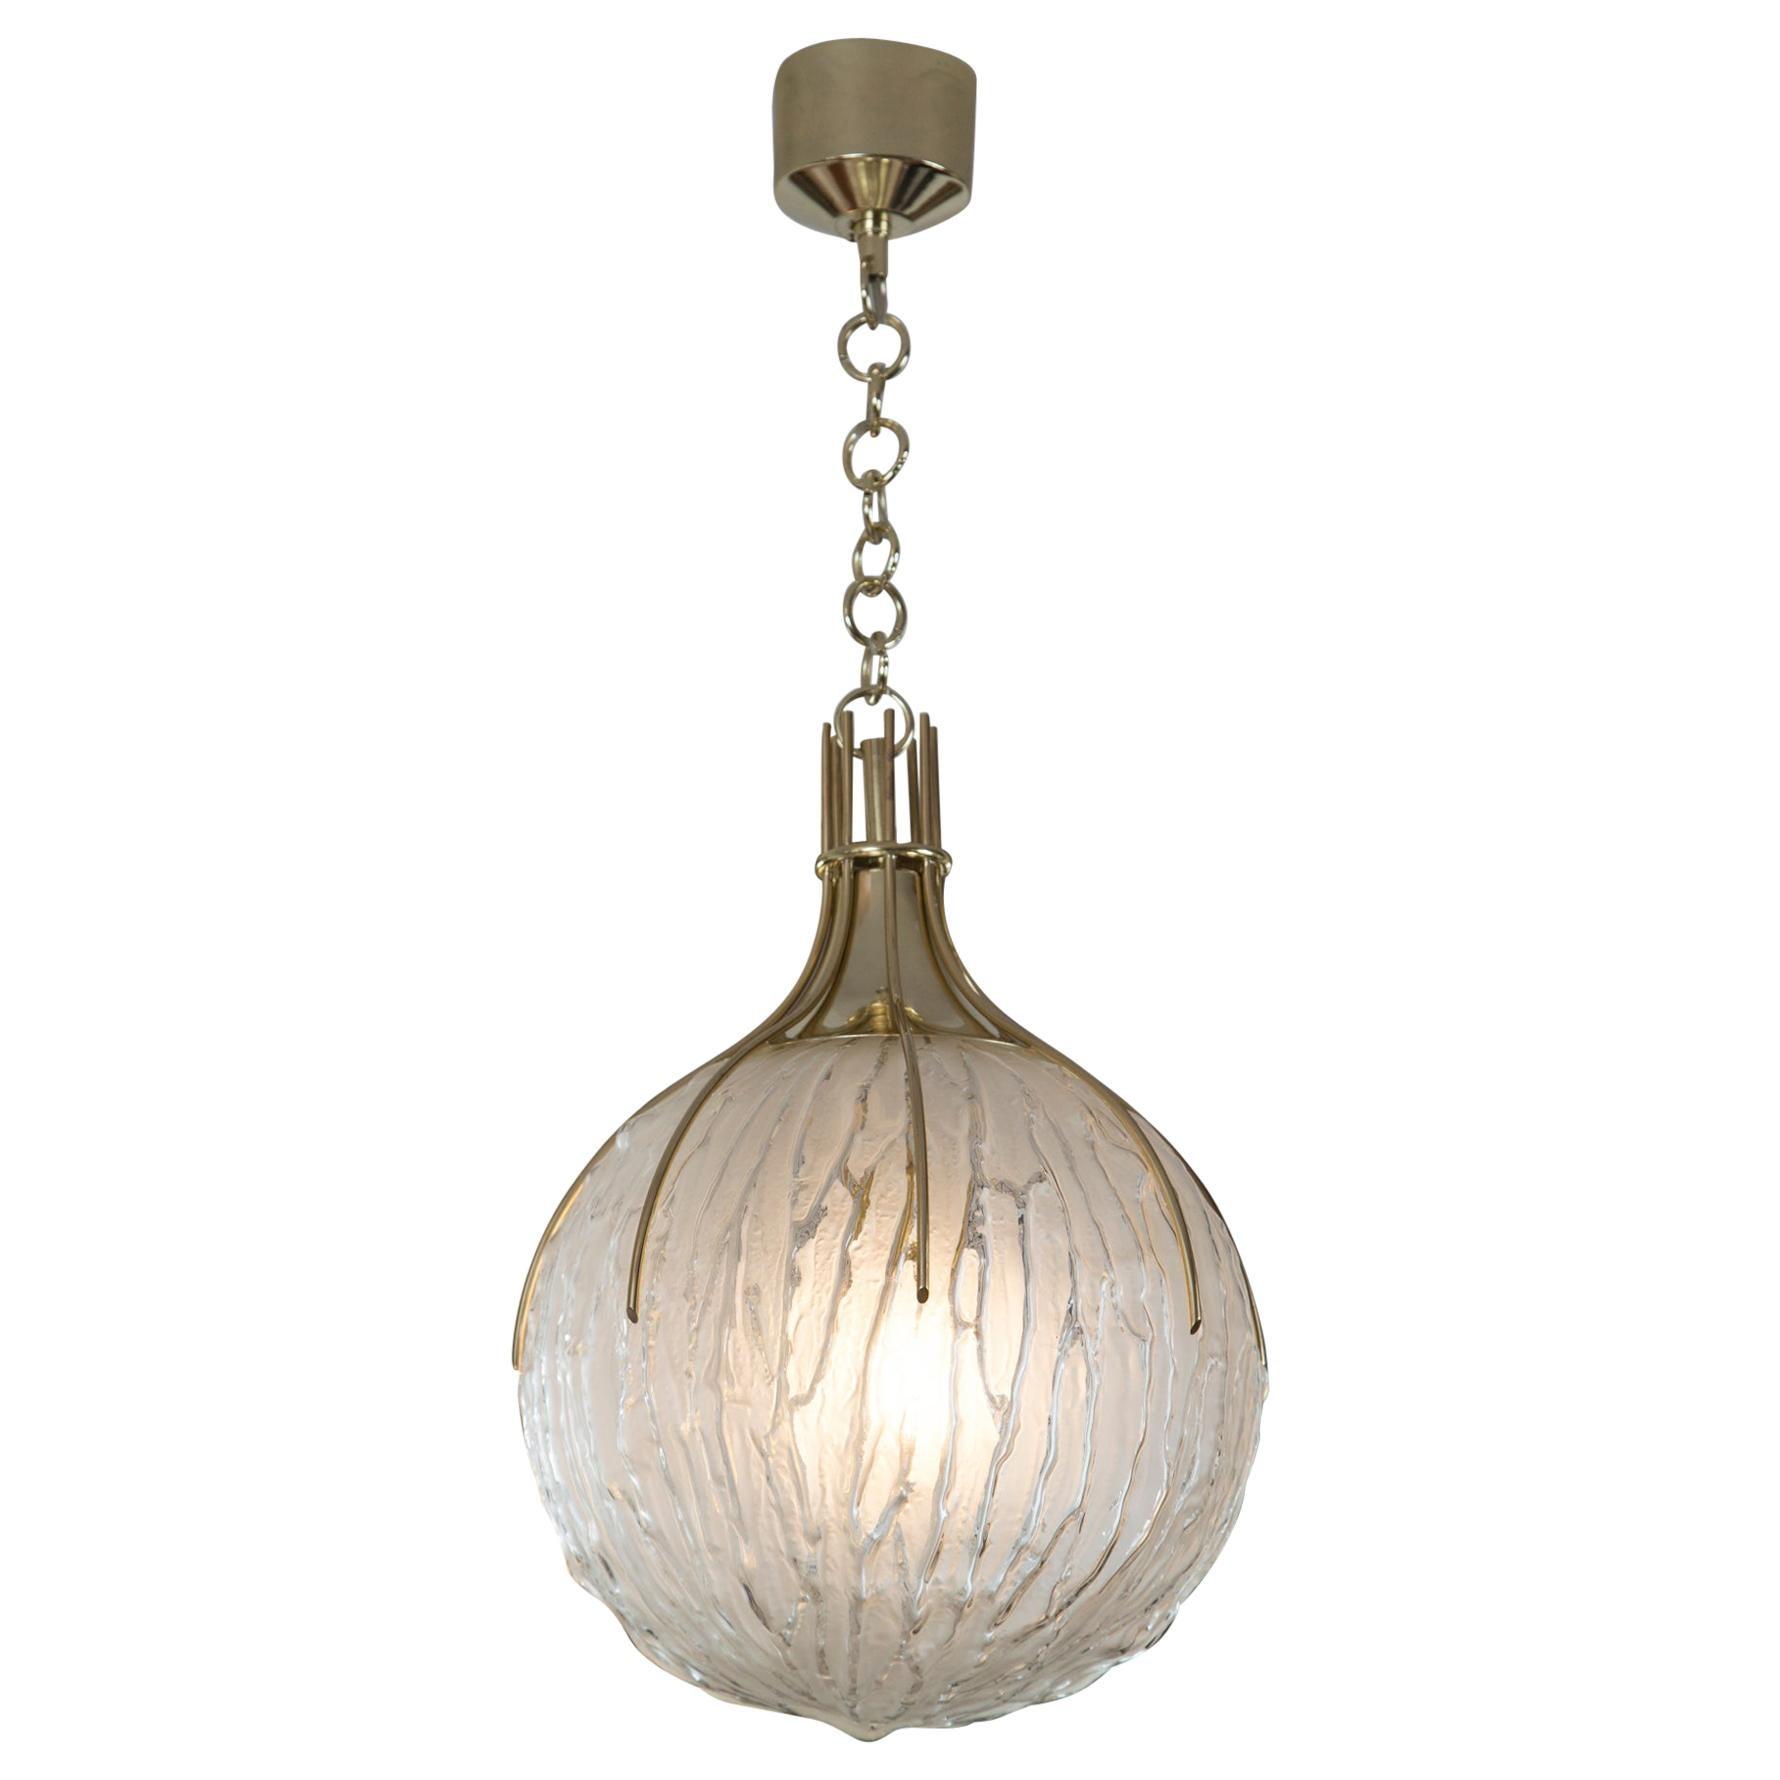 Vintage Italian Pendant Light by Angelo Brotto